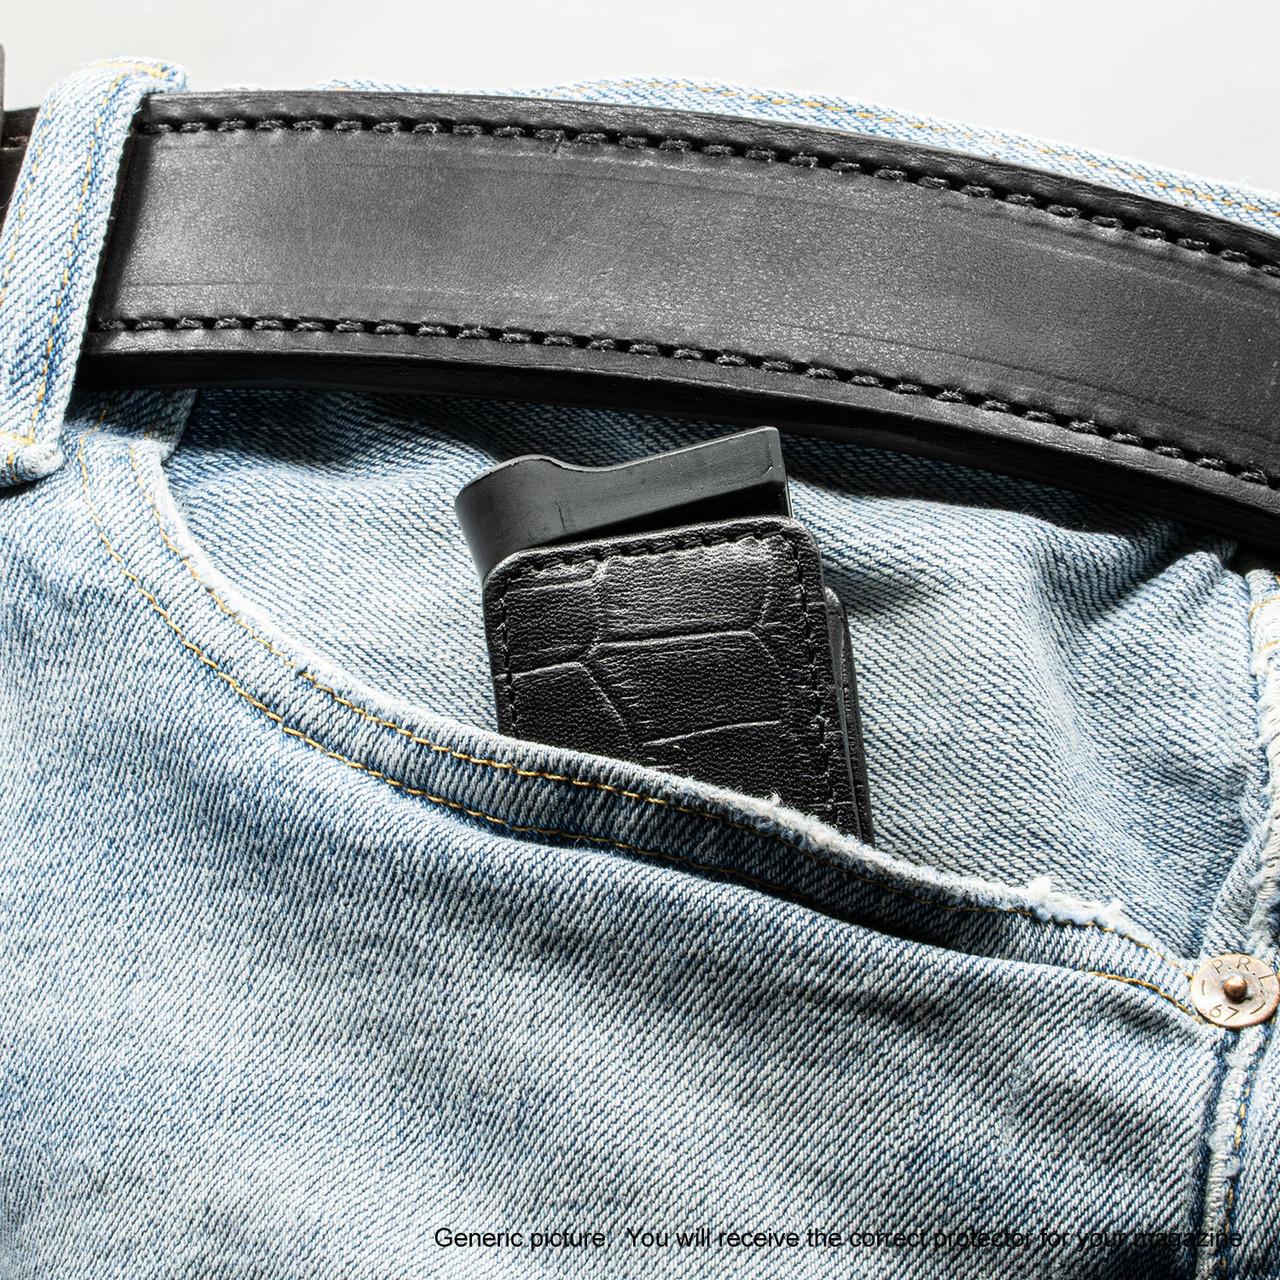 Springfield Micro Compact Black Alligator Magazine Pocket Protector